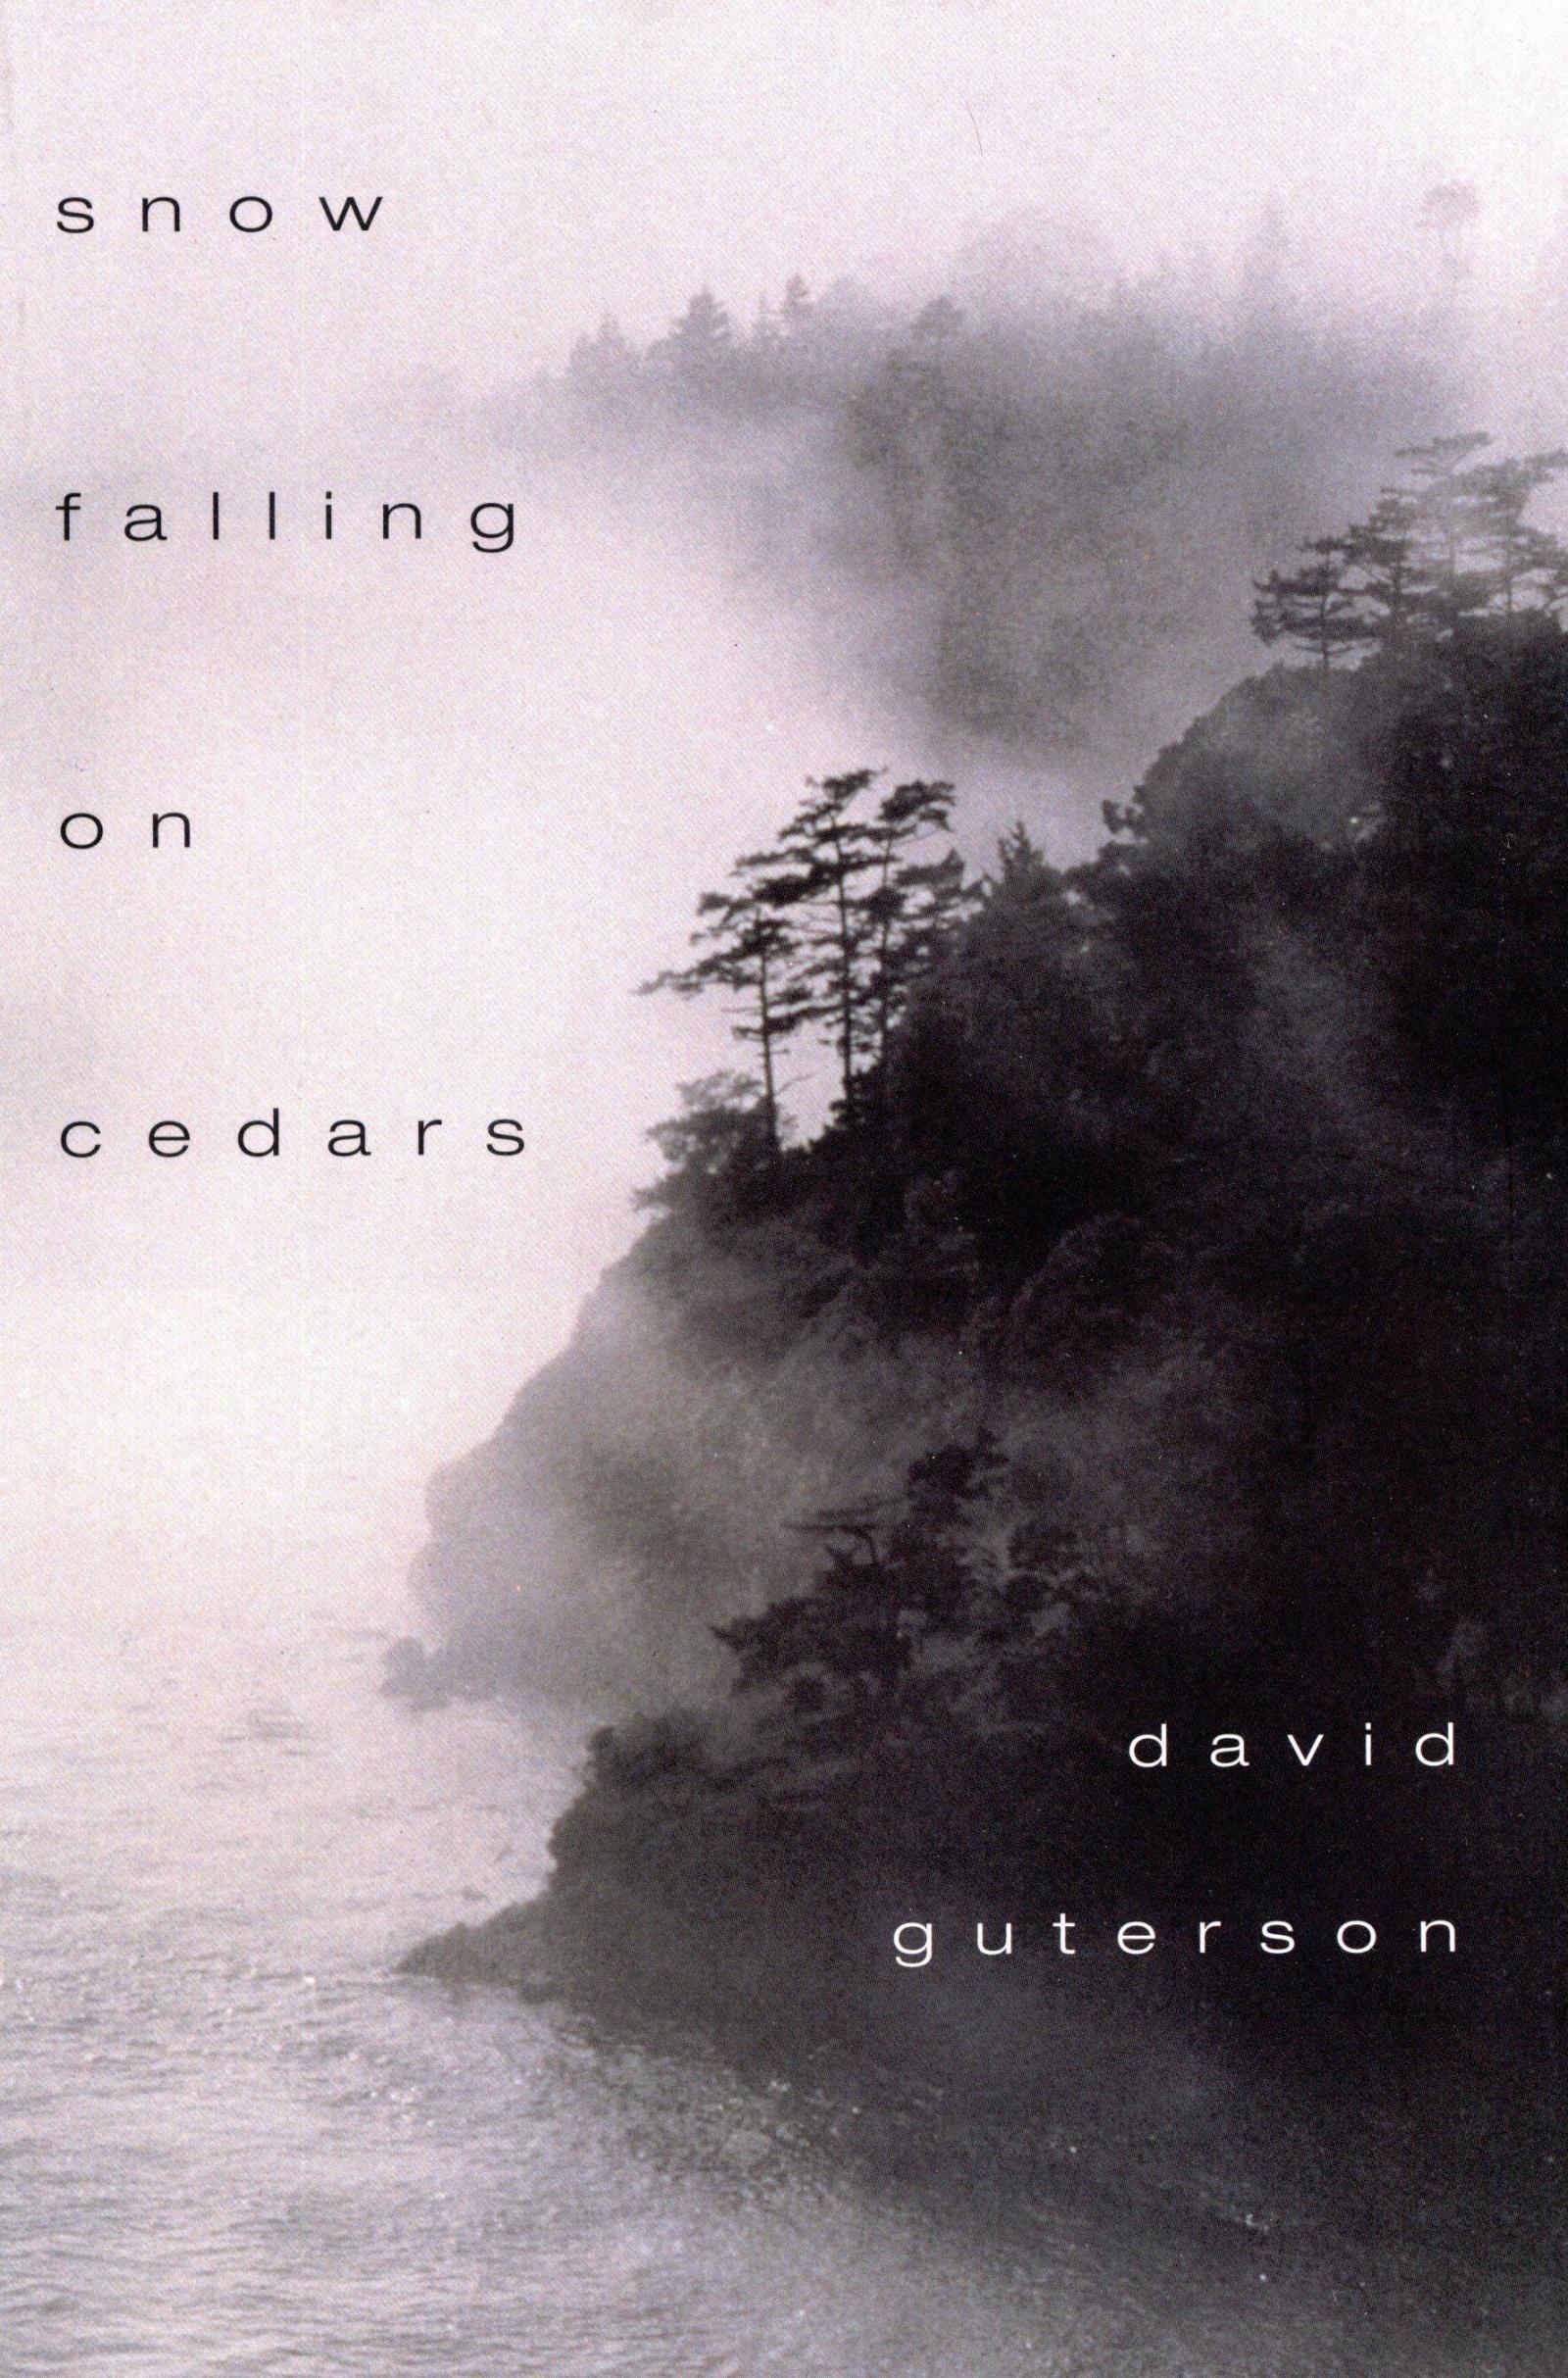 Snow falling on cedars [eBook]